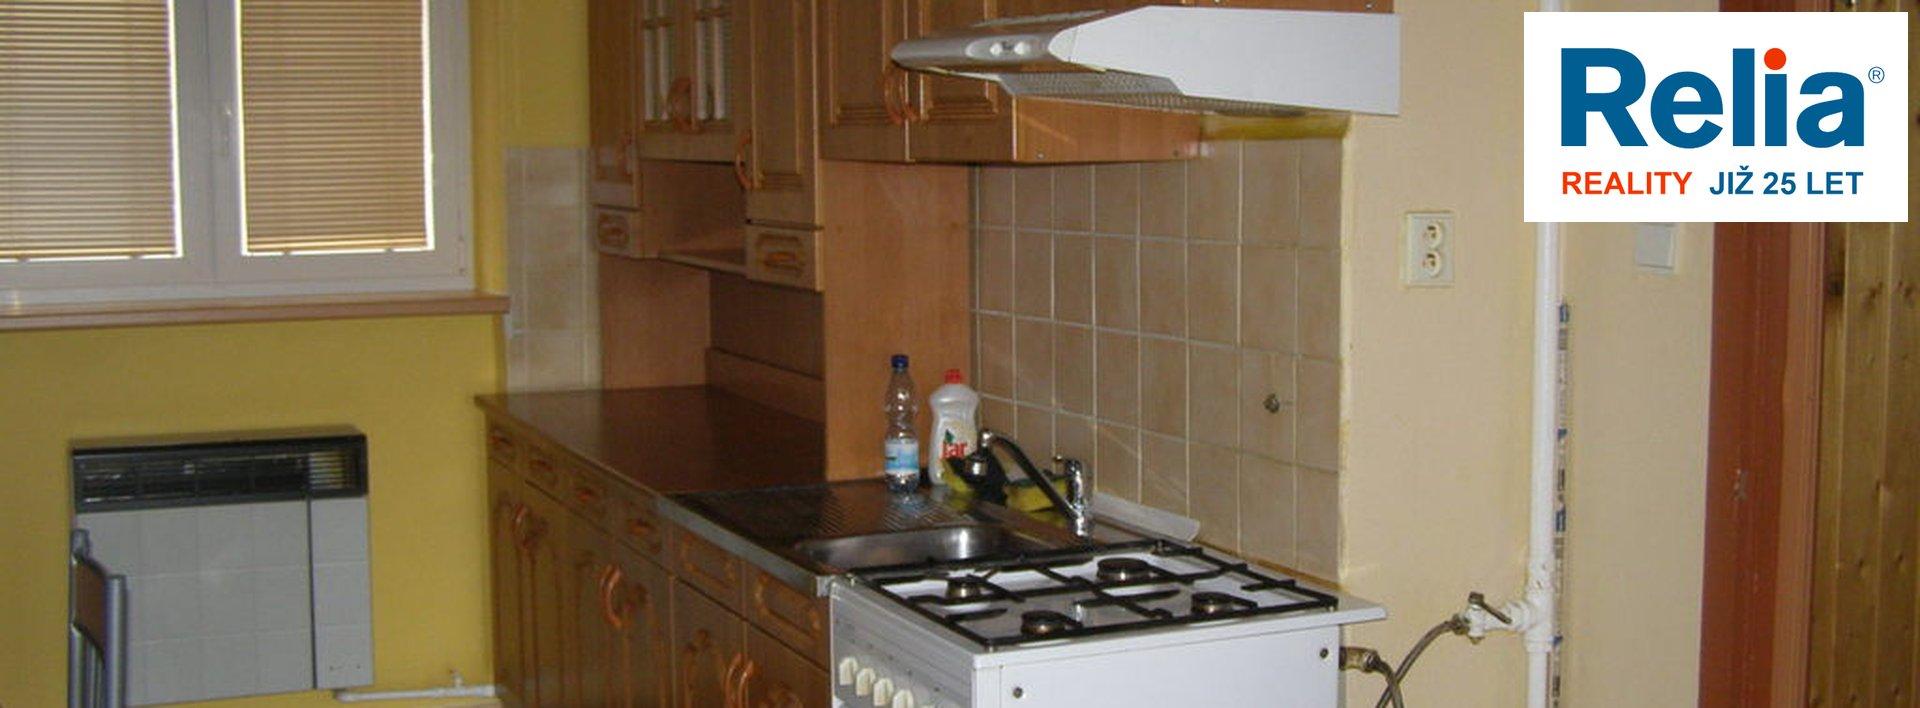 Pronájem bytu  2+1 57 m2 v Ústí n.L. - Skřívánek, Ev.č.: N46454